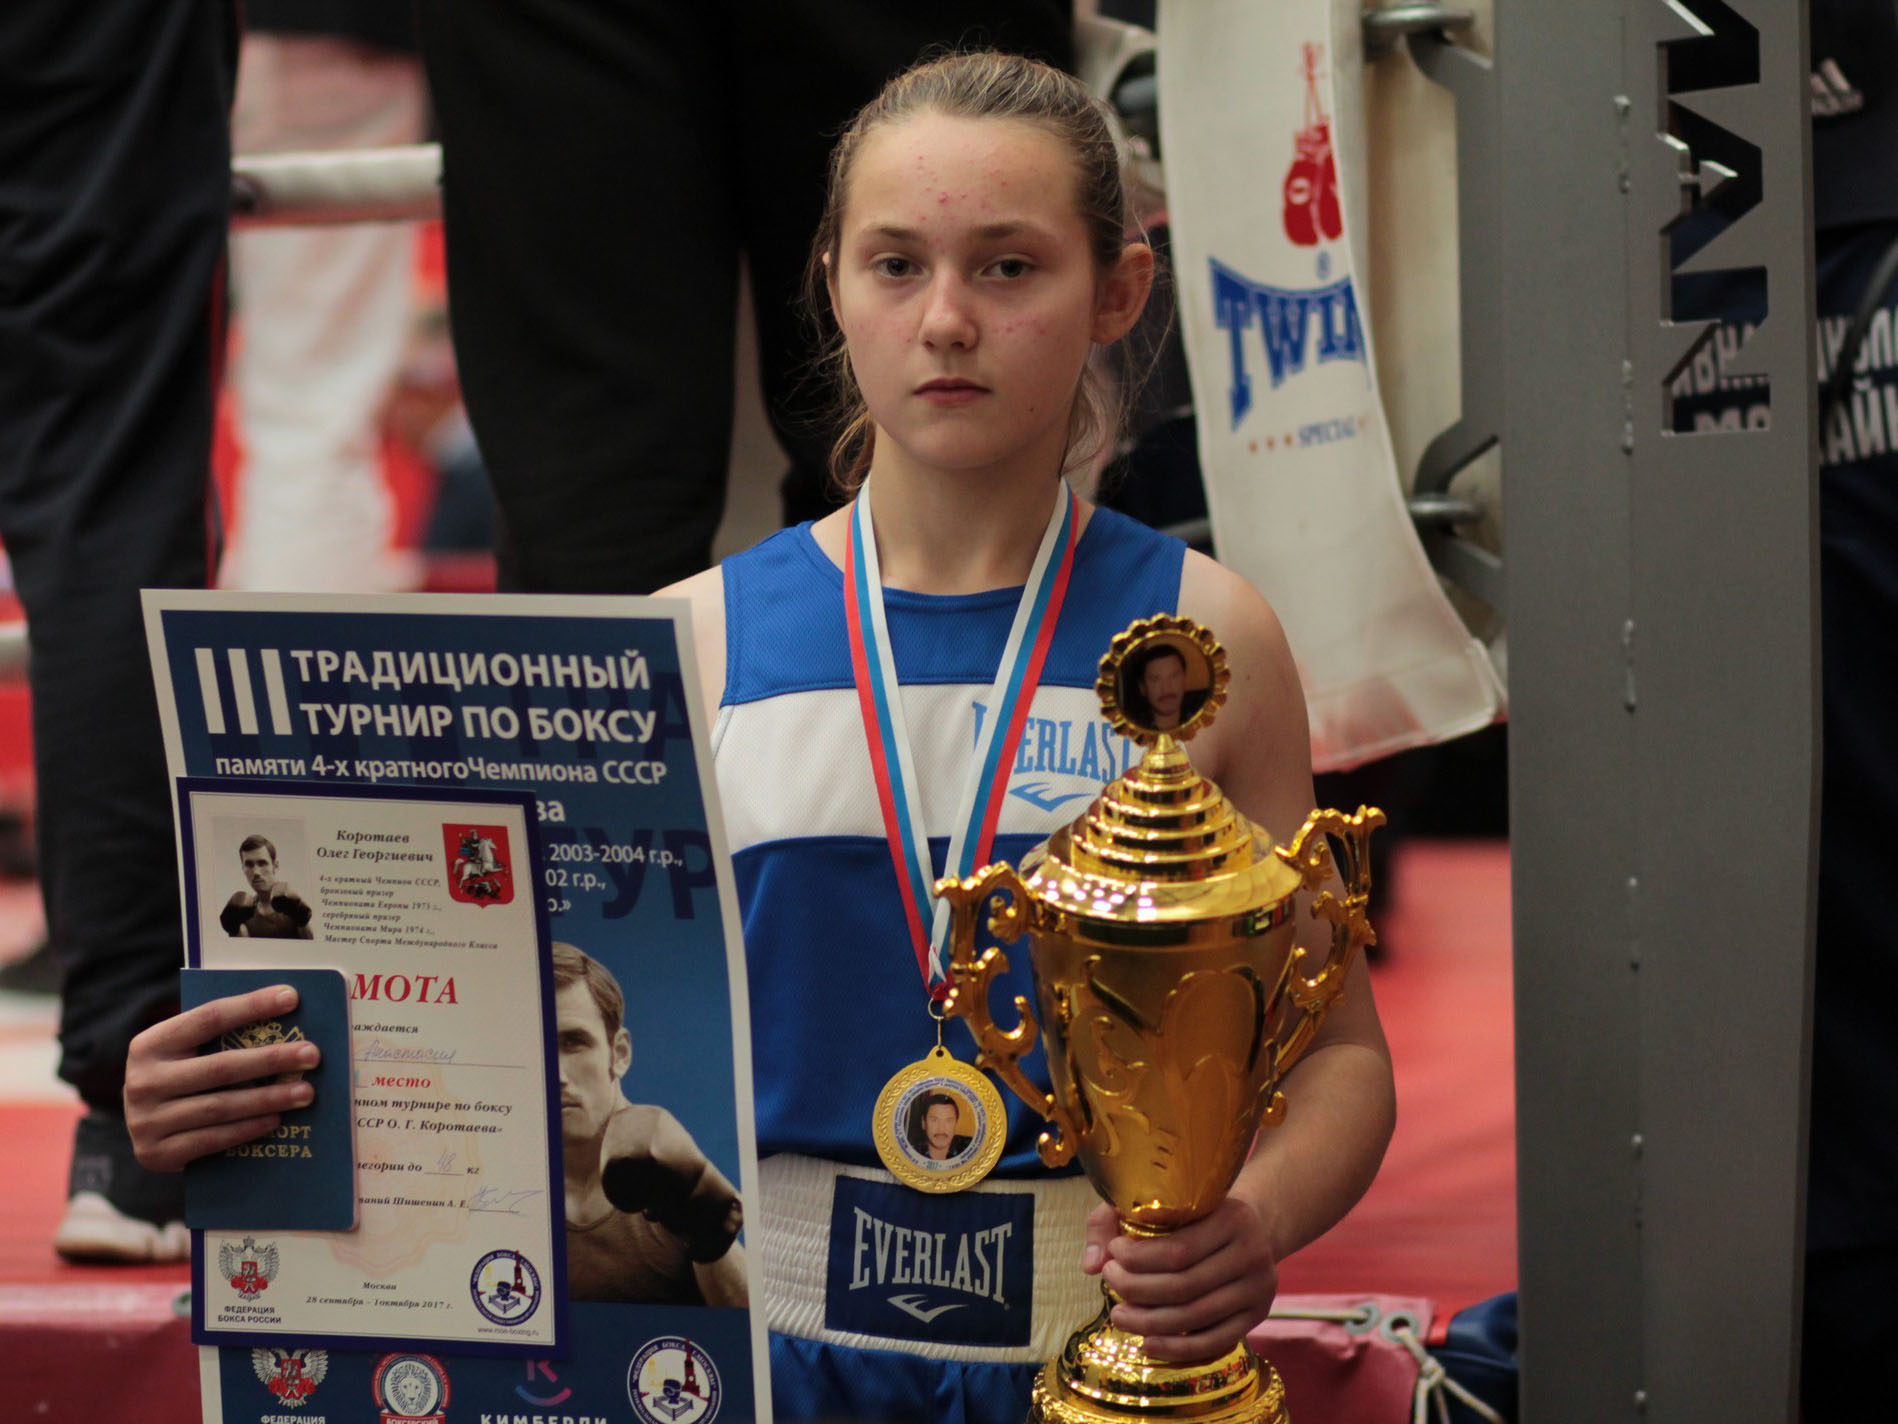 Анастасия Кириенко